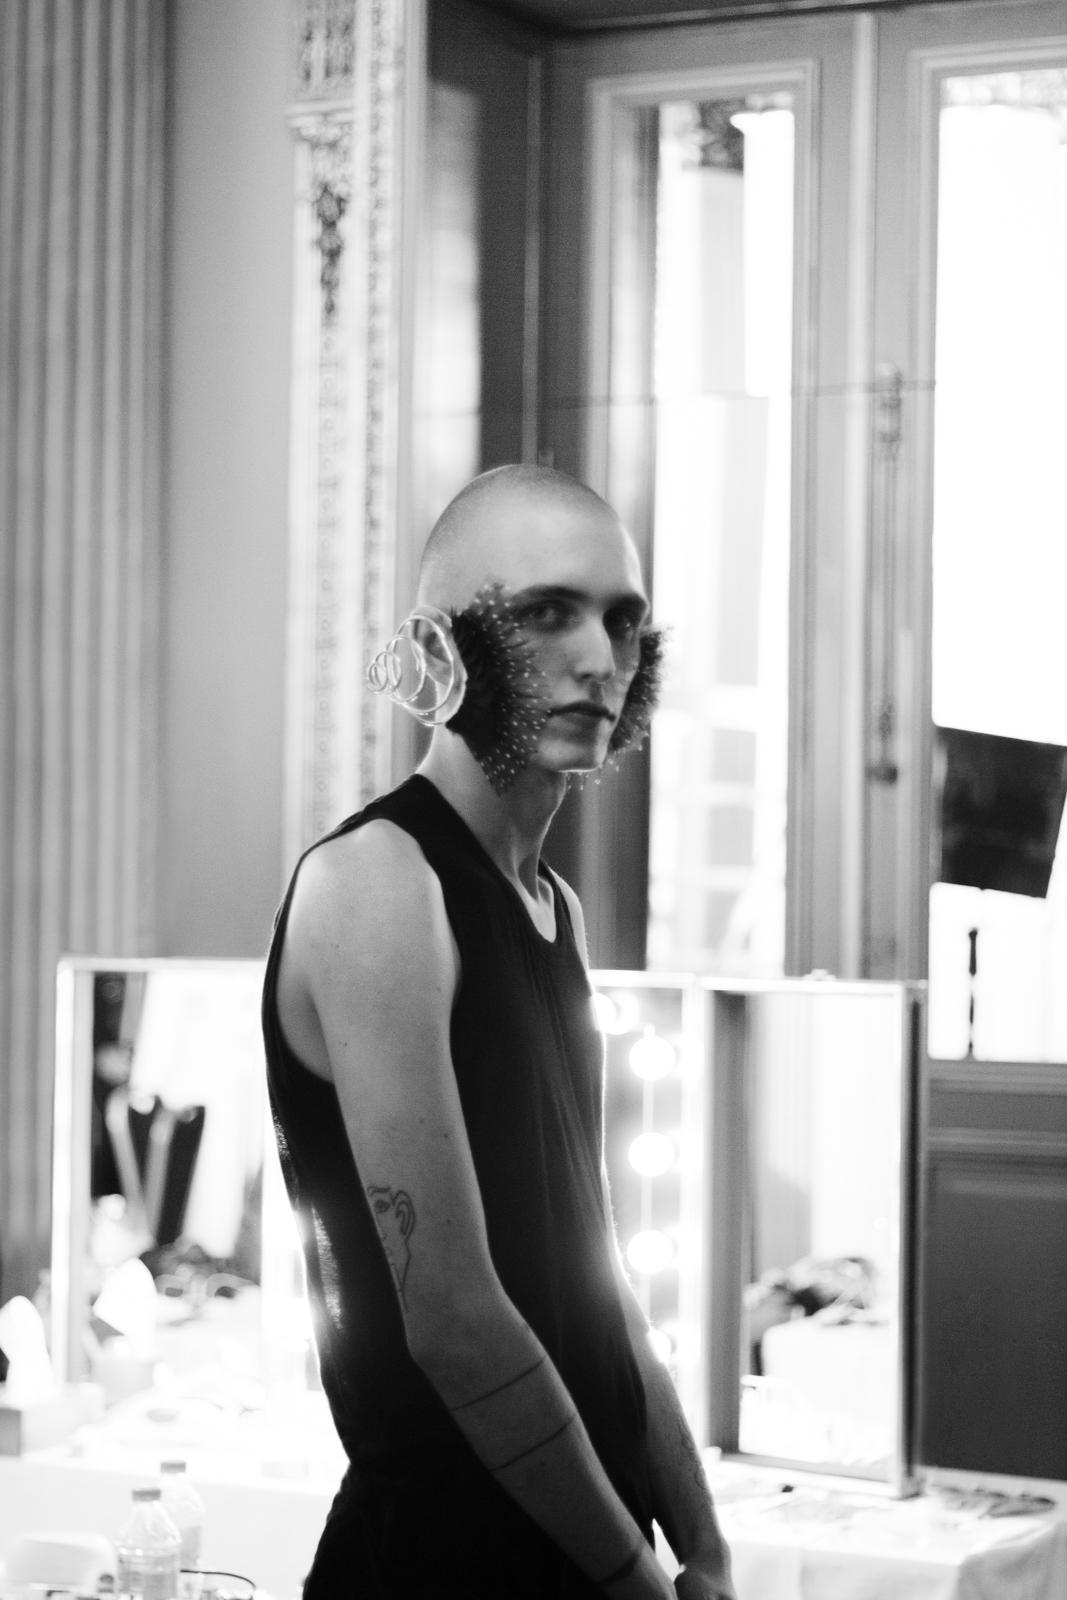 Fashion  darioruggiero henrikvibskov Photography  backstage portrait